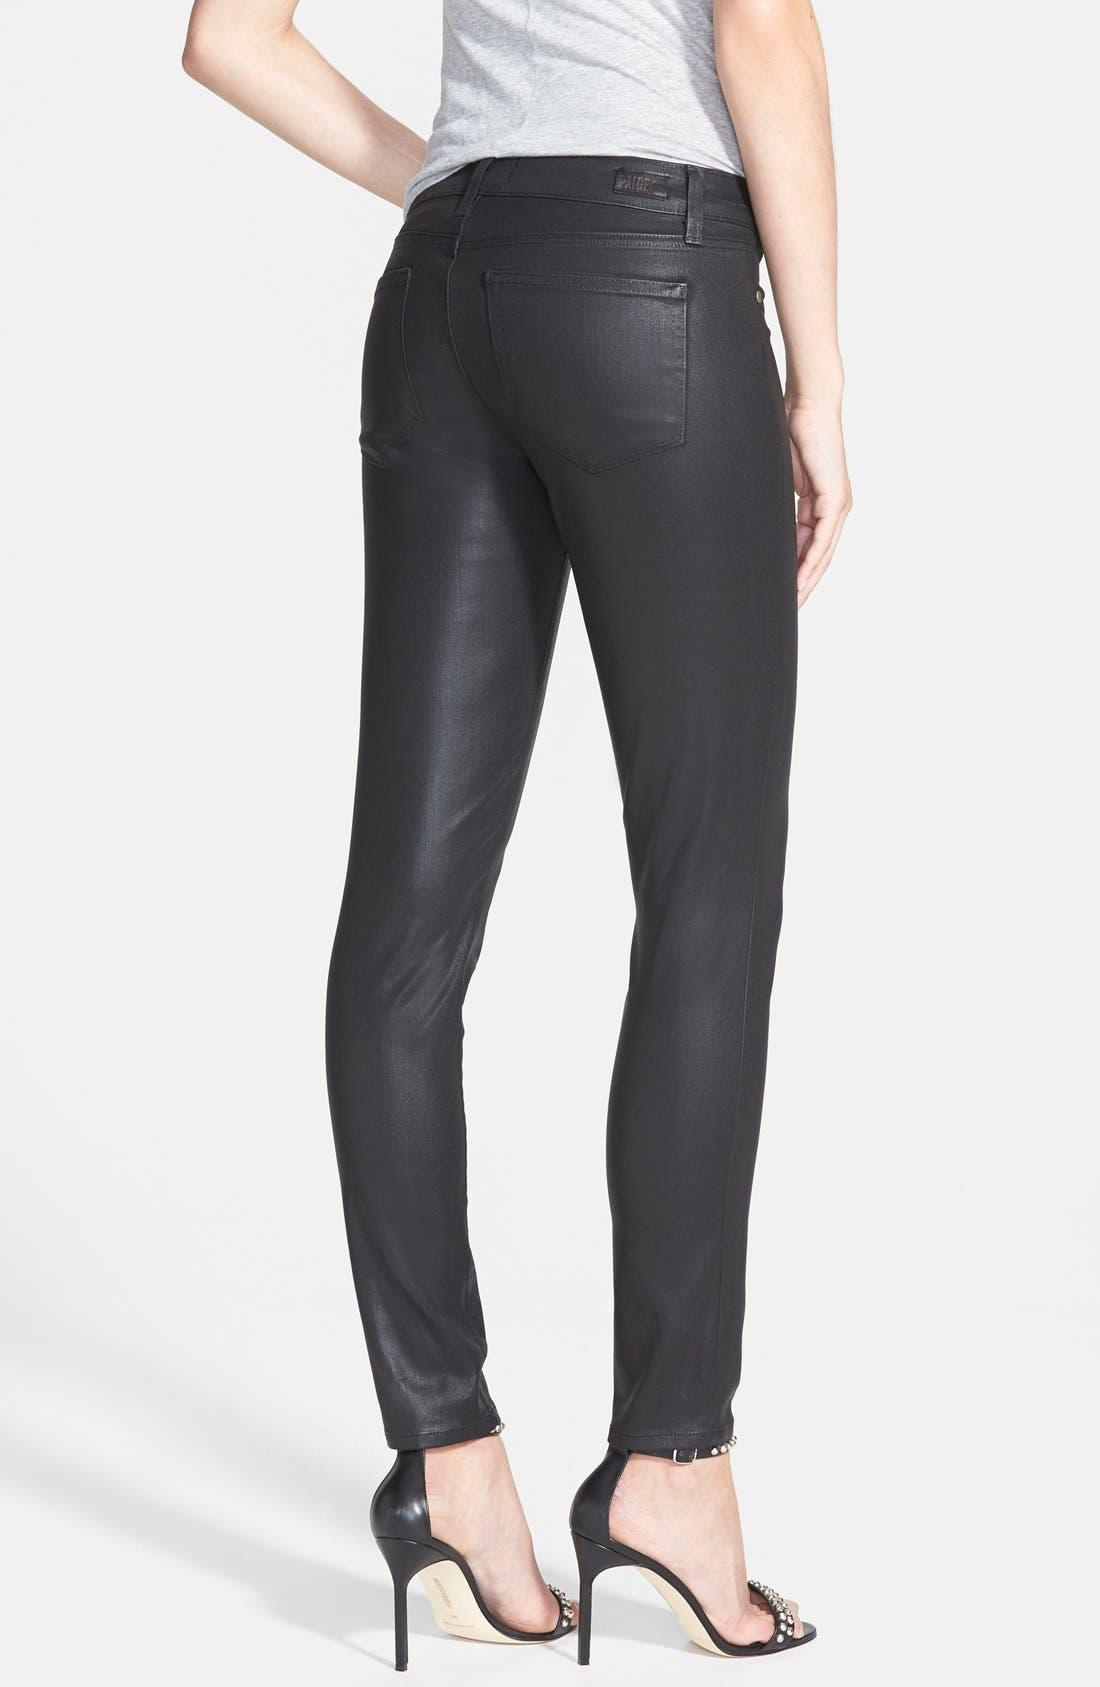 'Verdugo' Coated Ultra Skinny Ankle Jeans,                             Alternate thumbnail 2, color,                             001